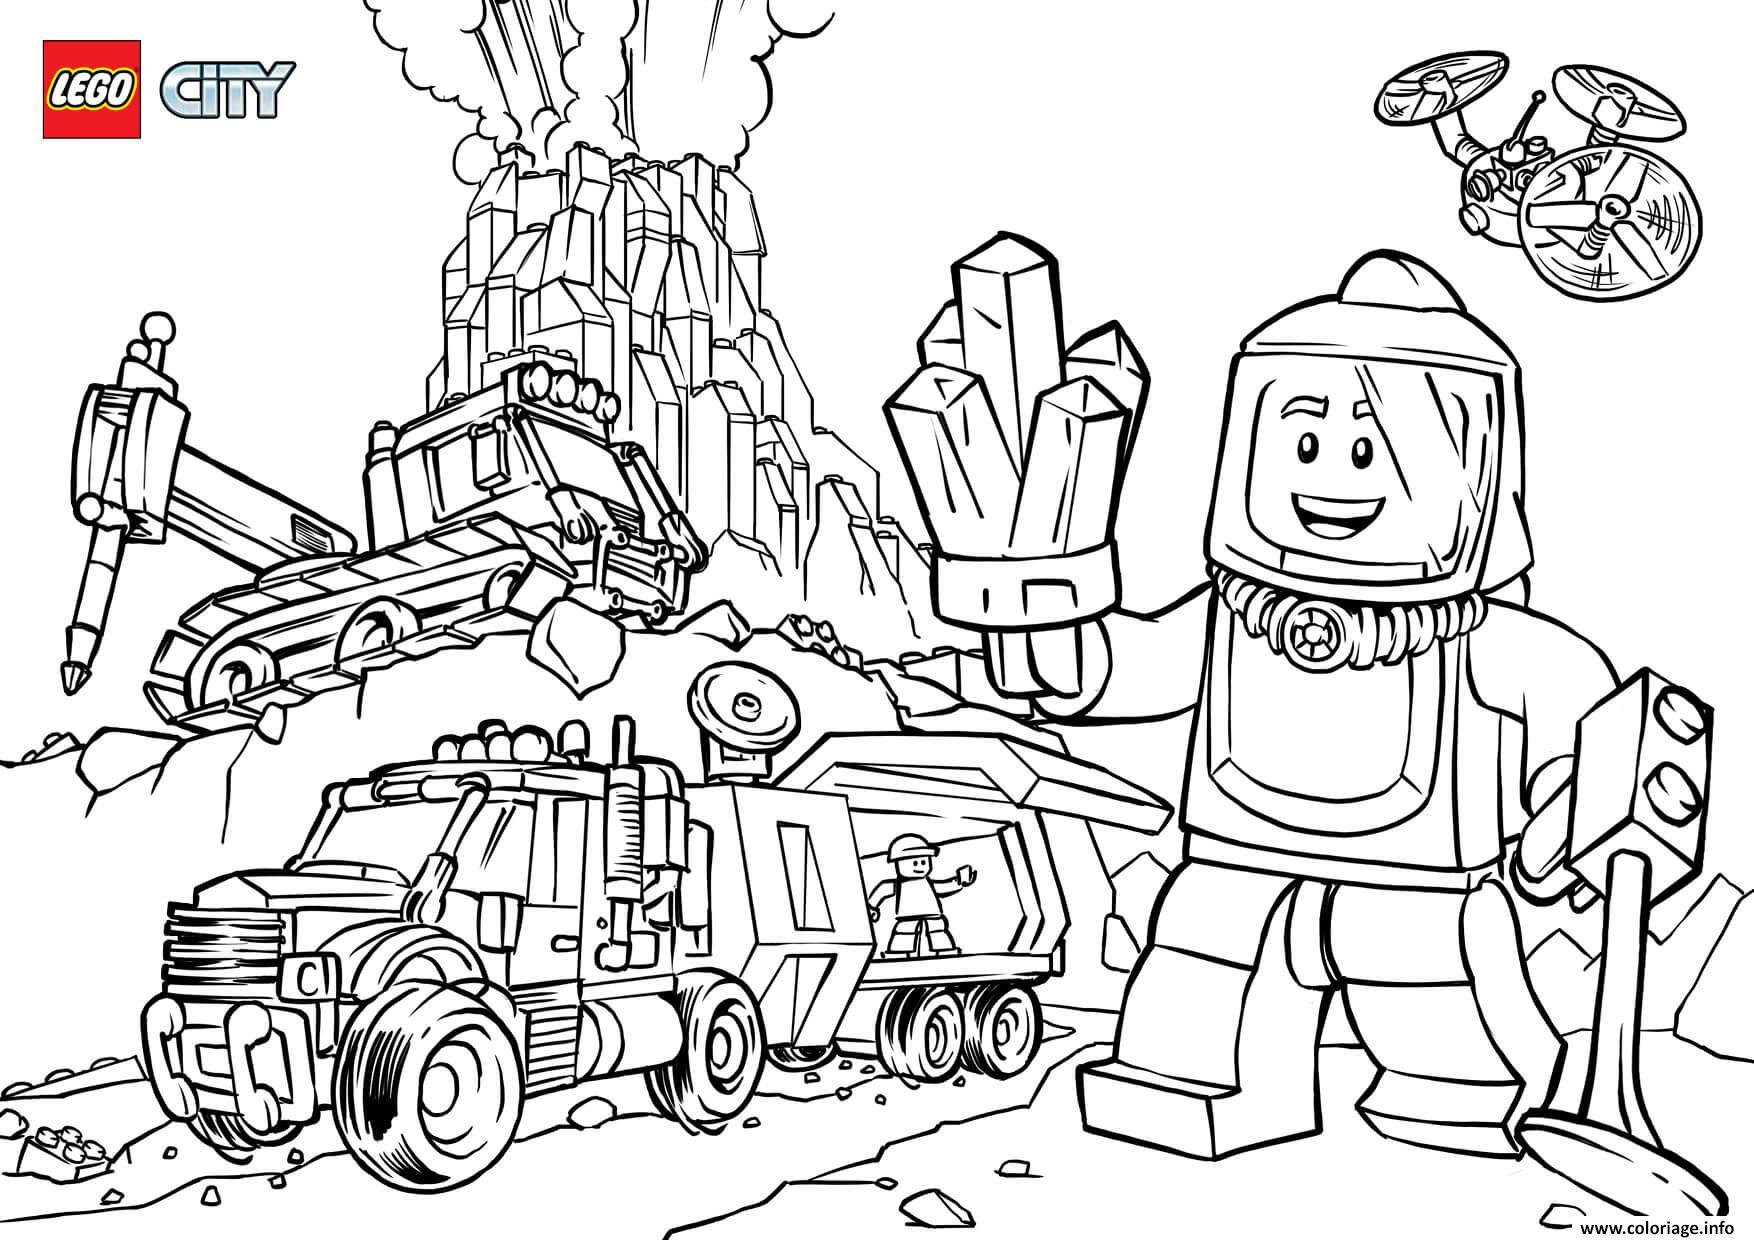 Coloriage Lego City Volcano Explorers Dessin Lego City A Imprimer